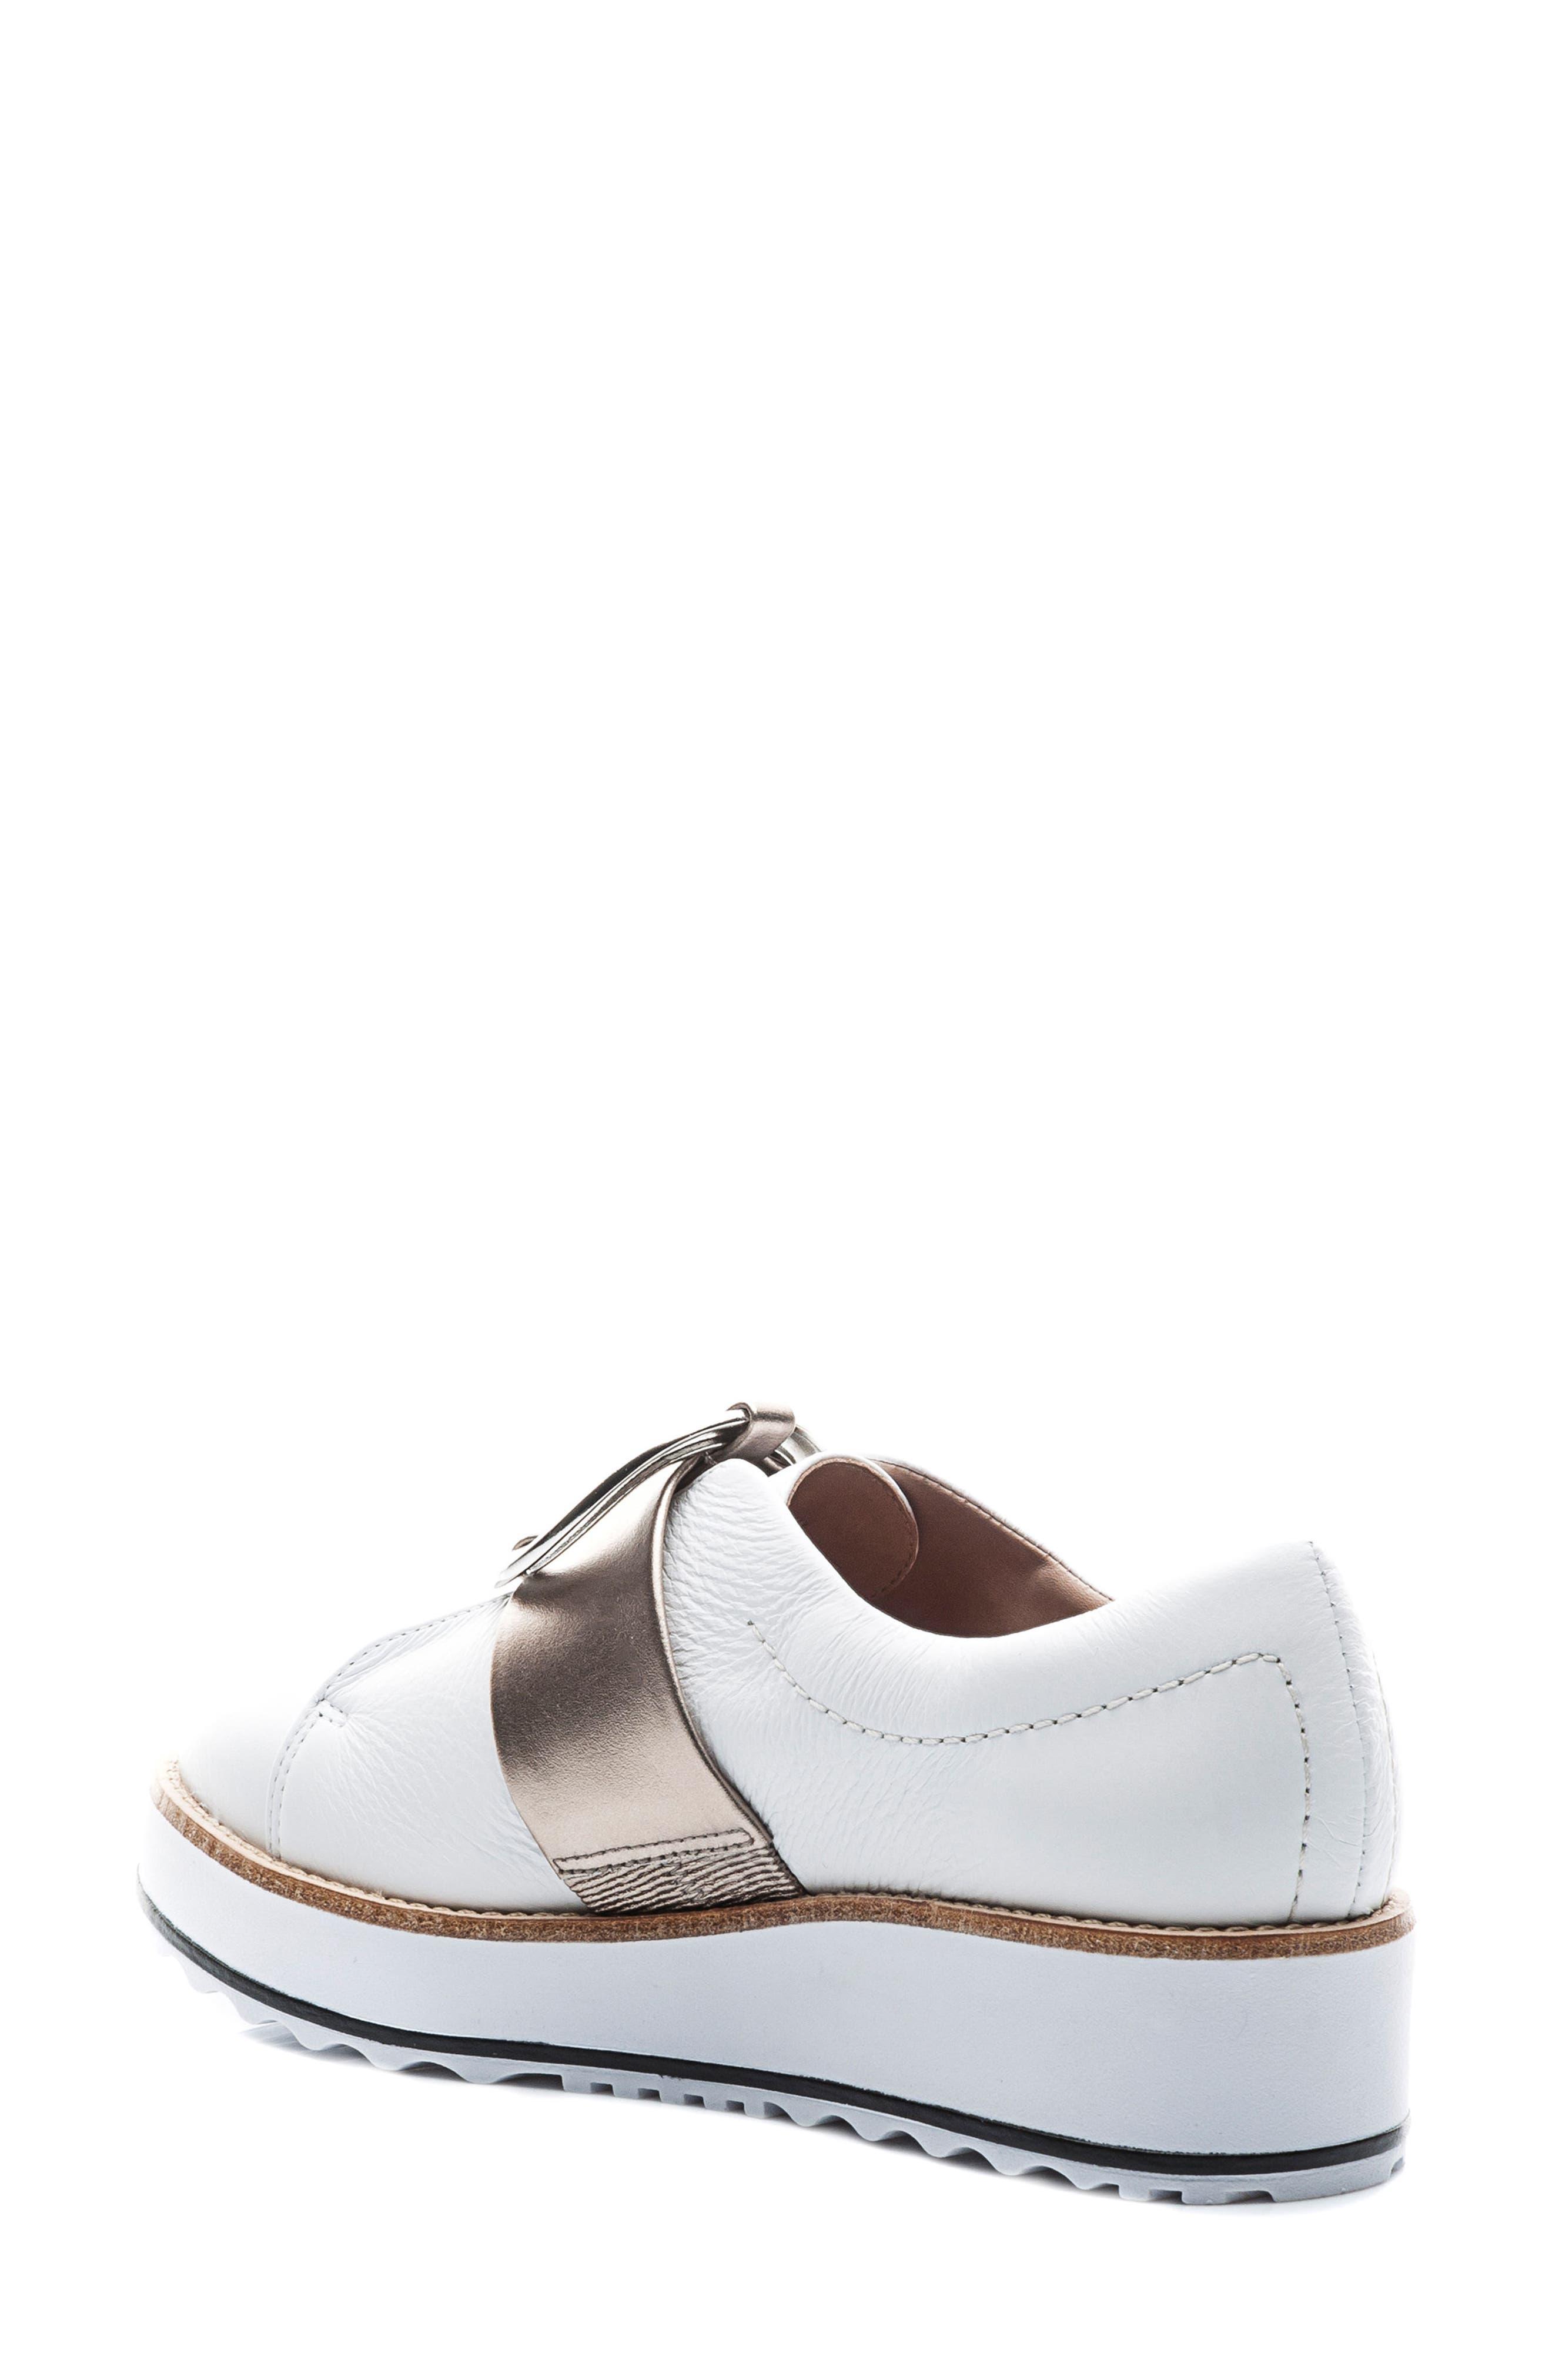 Susan Wedge Sneaker,                             Alternate thumbnail 2, color,                             100